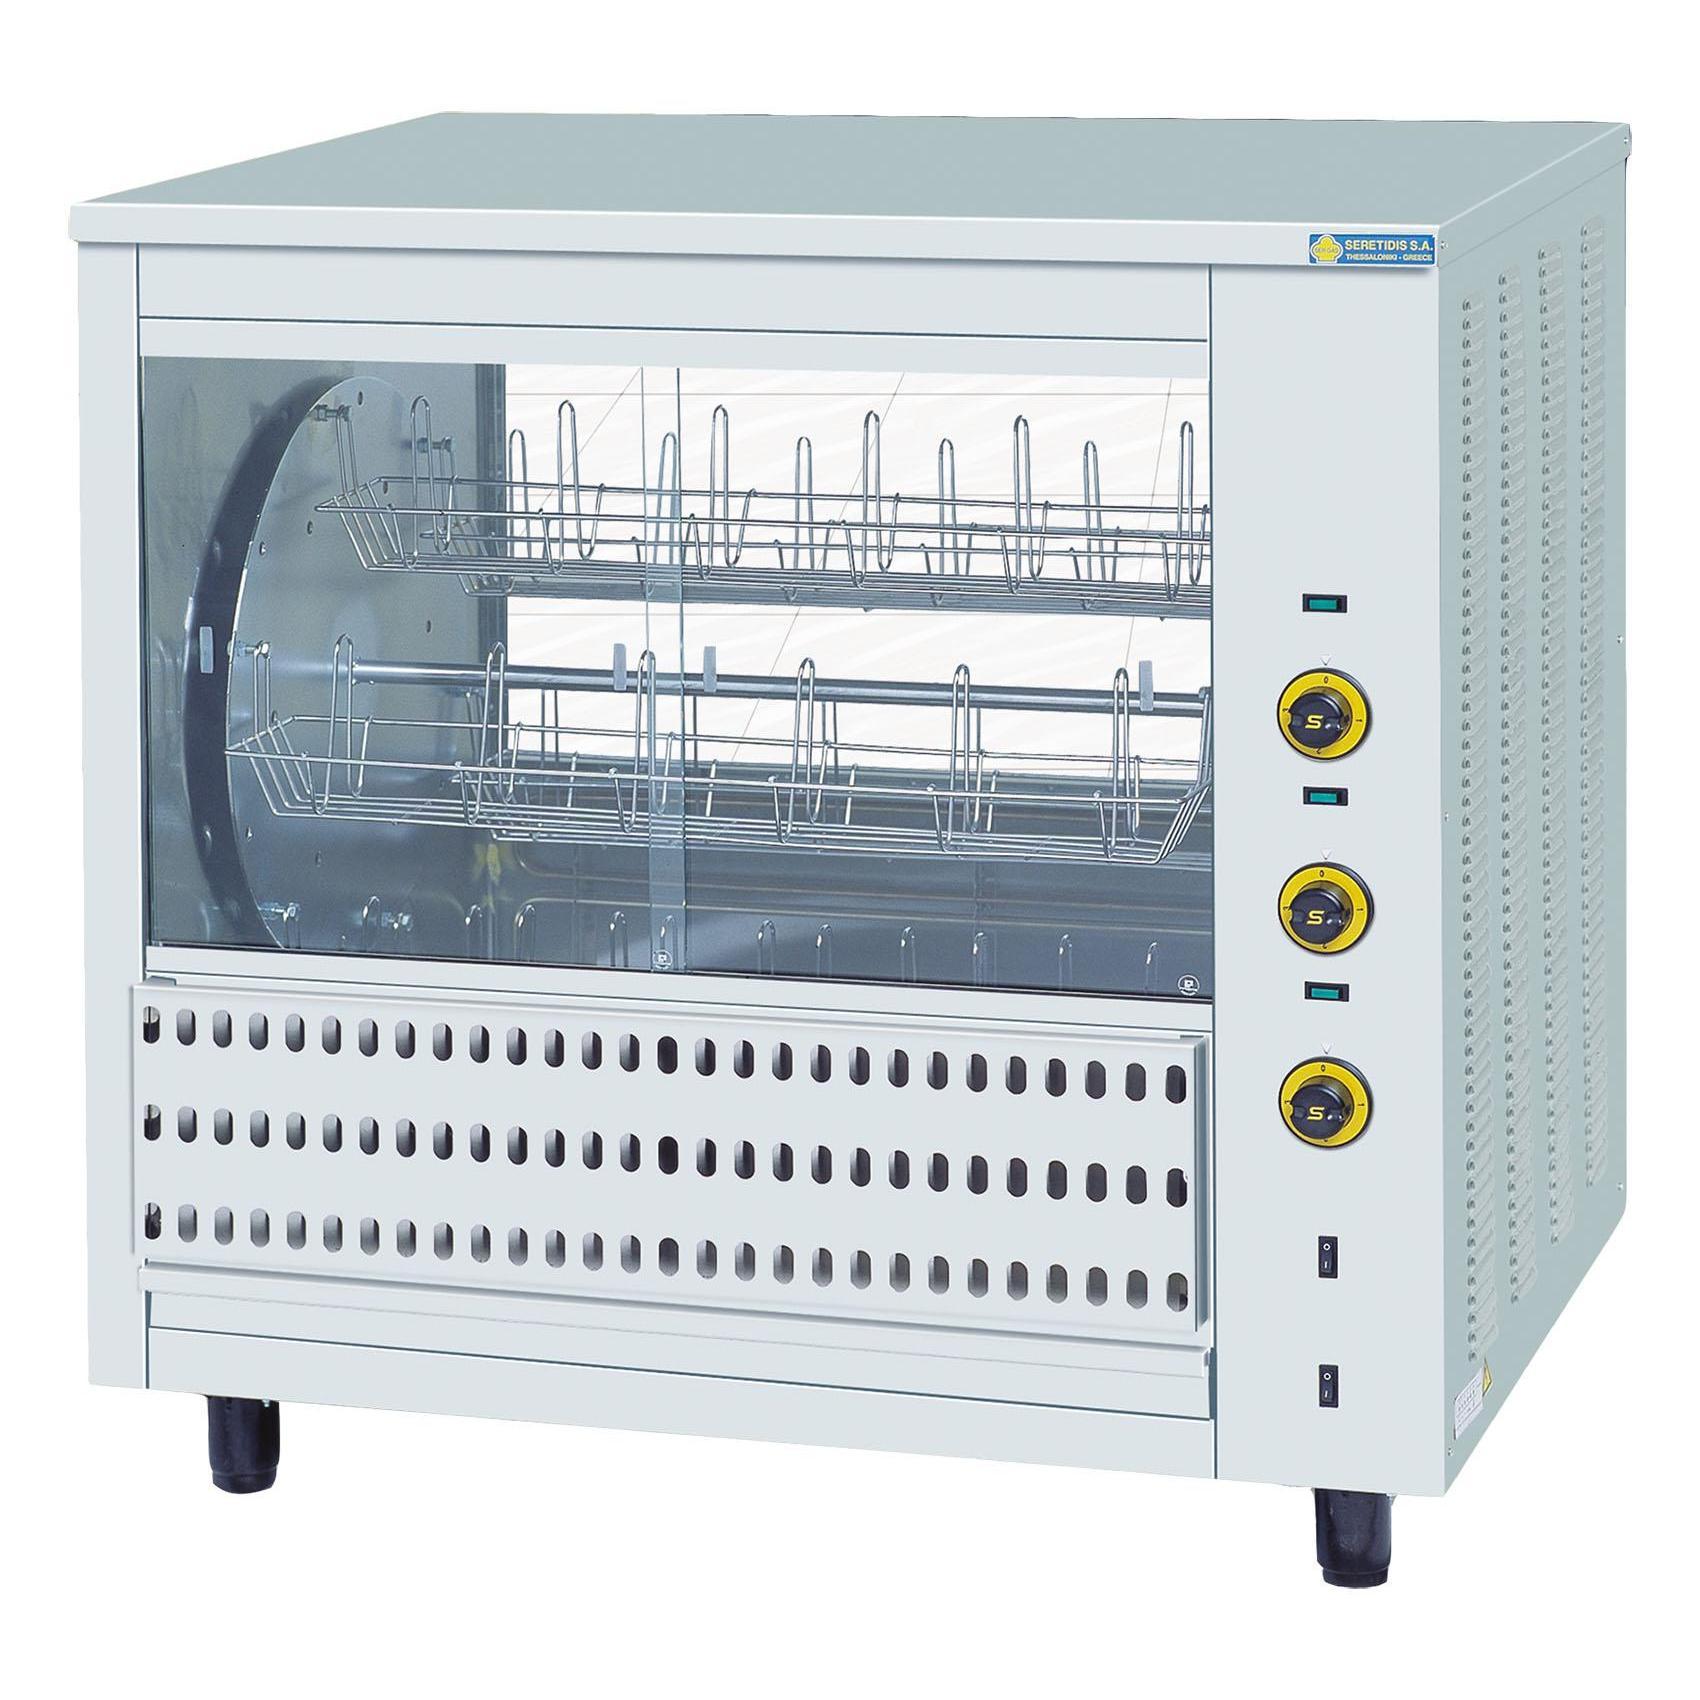 SERGAS T36 Επιτραπέζια Ηλεκτρική Κοτοπουλιέρα με Περιστρεφόμενα Καλαθάκια - Χωρη επαγγελματικός εξοπλισμός   κουζίνες πλατό φριτέζες βραστήρες   κοτοπουλιέρες  ε